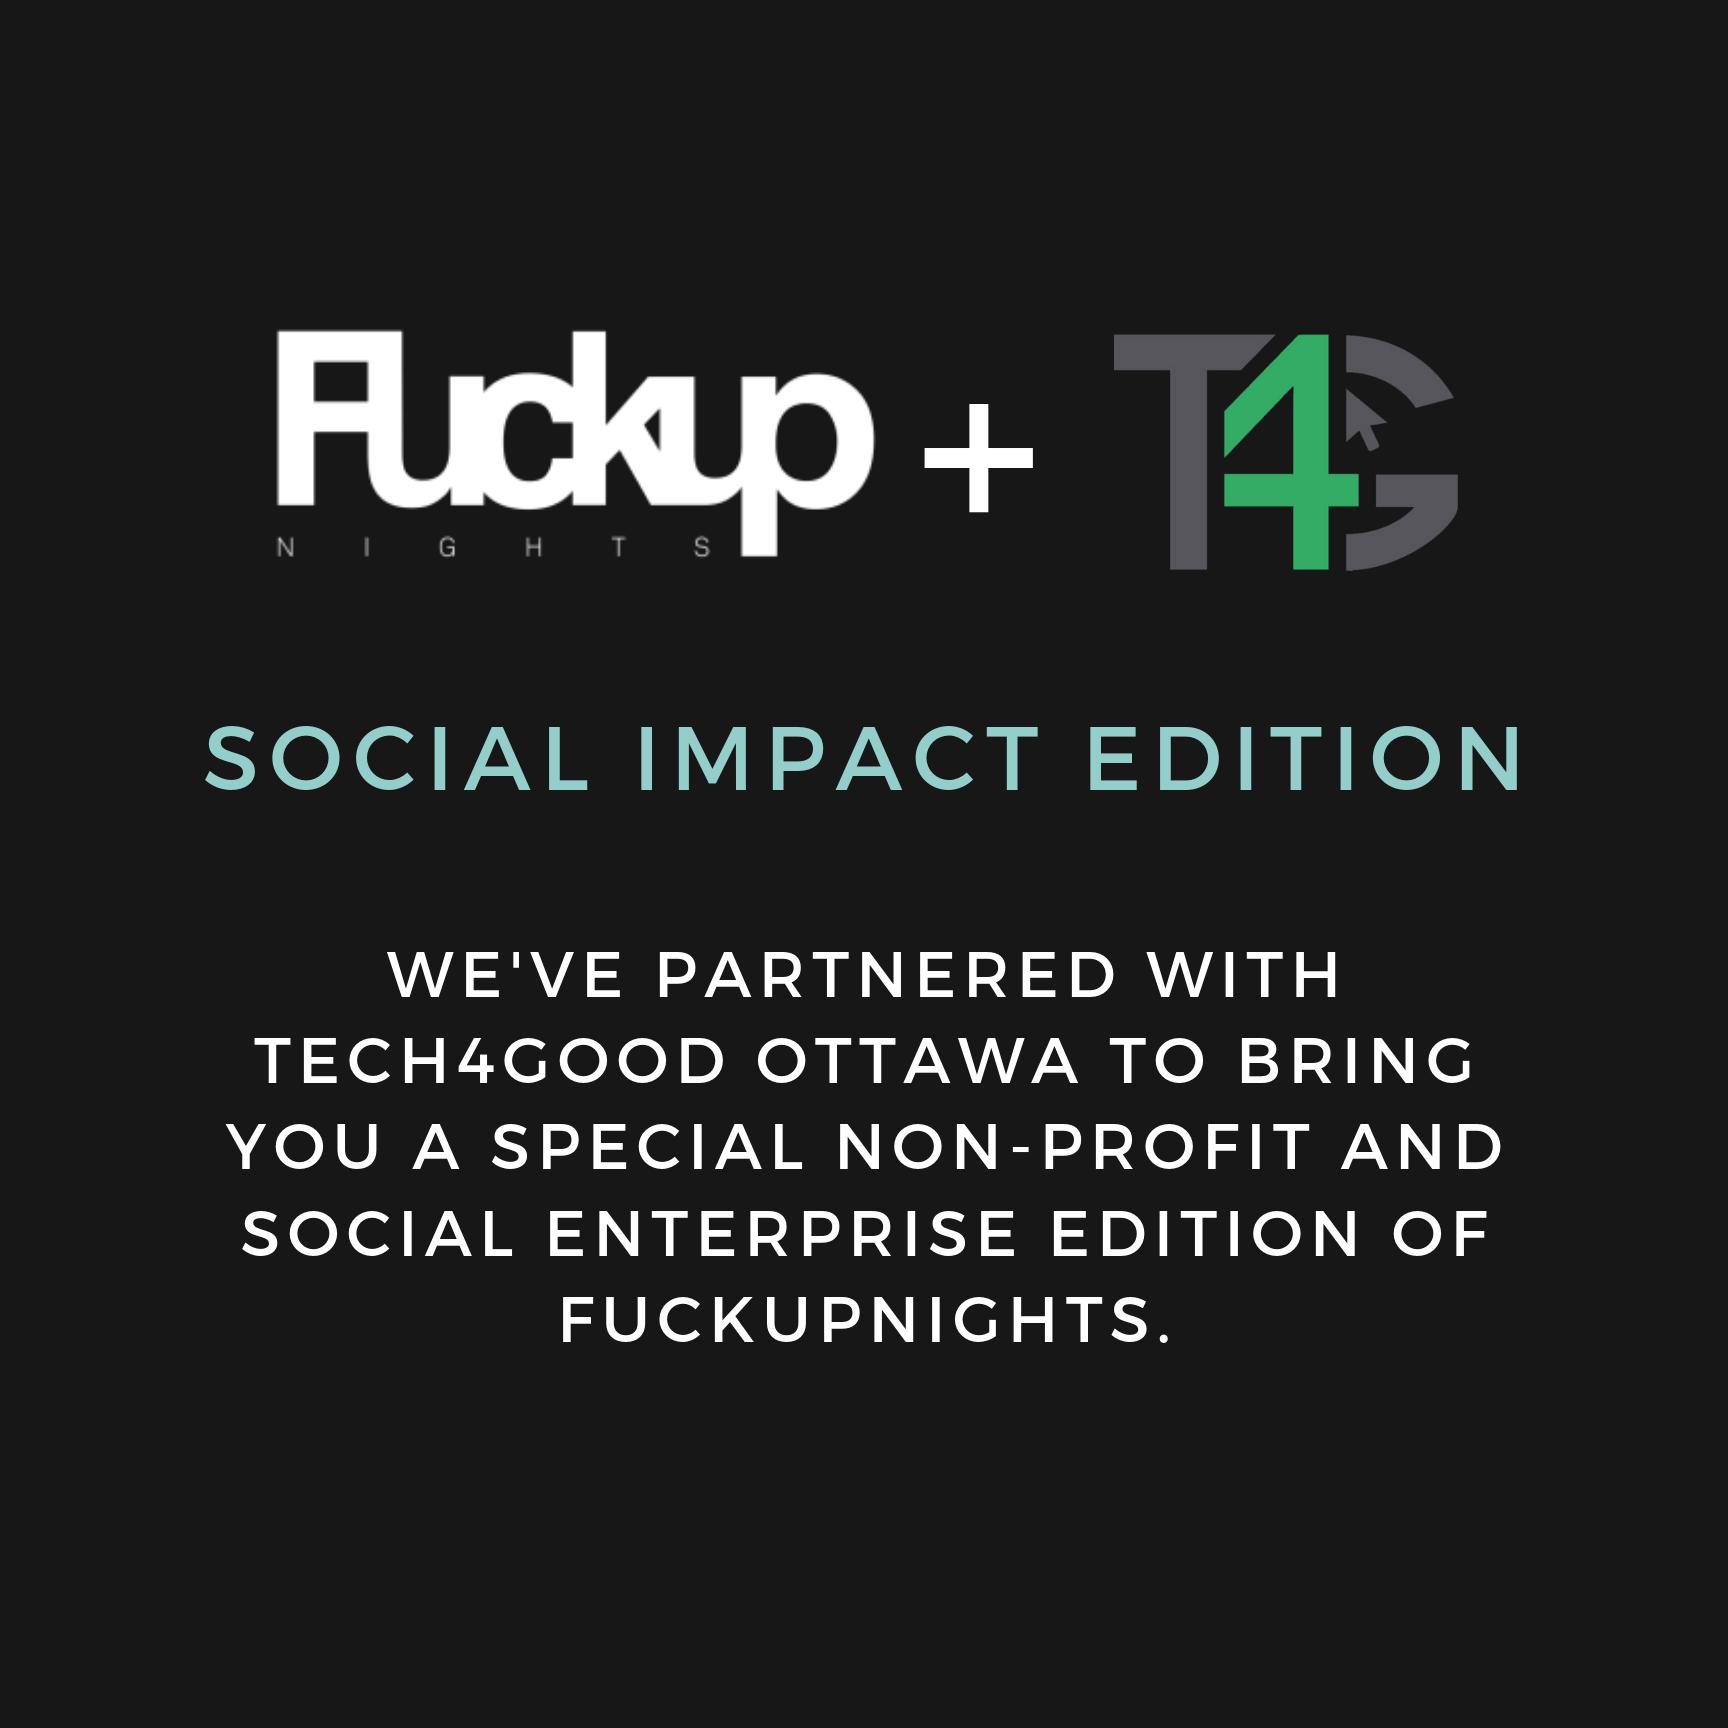 FuckupNights and Tech4Good Ottawa for non-profits and social enterprise